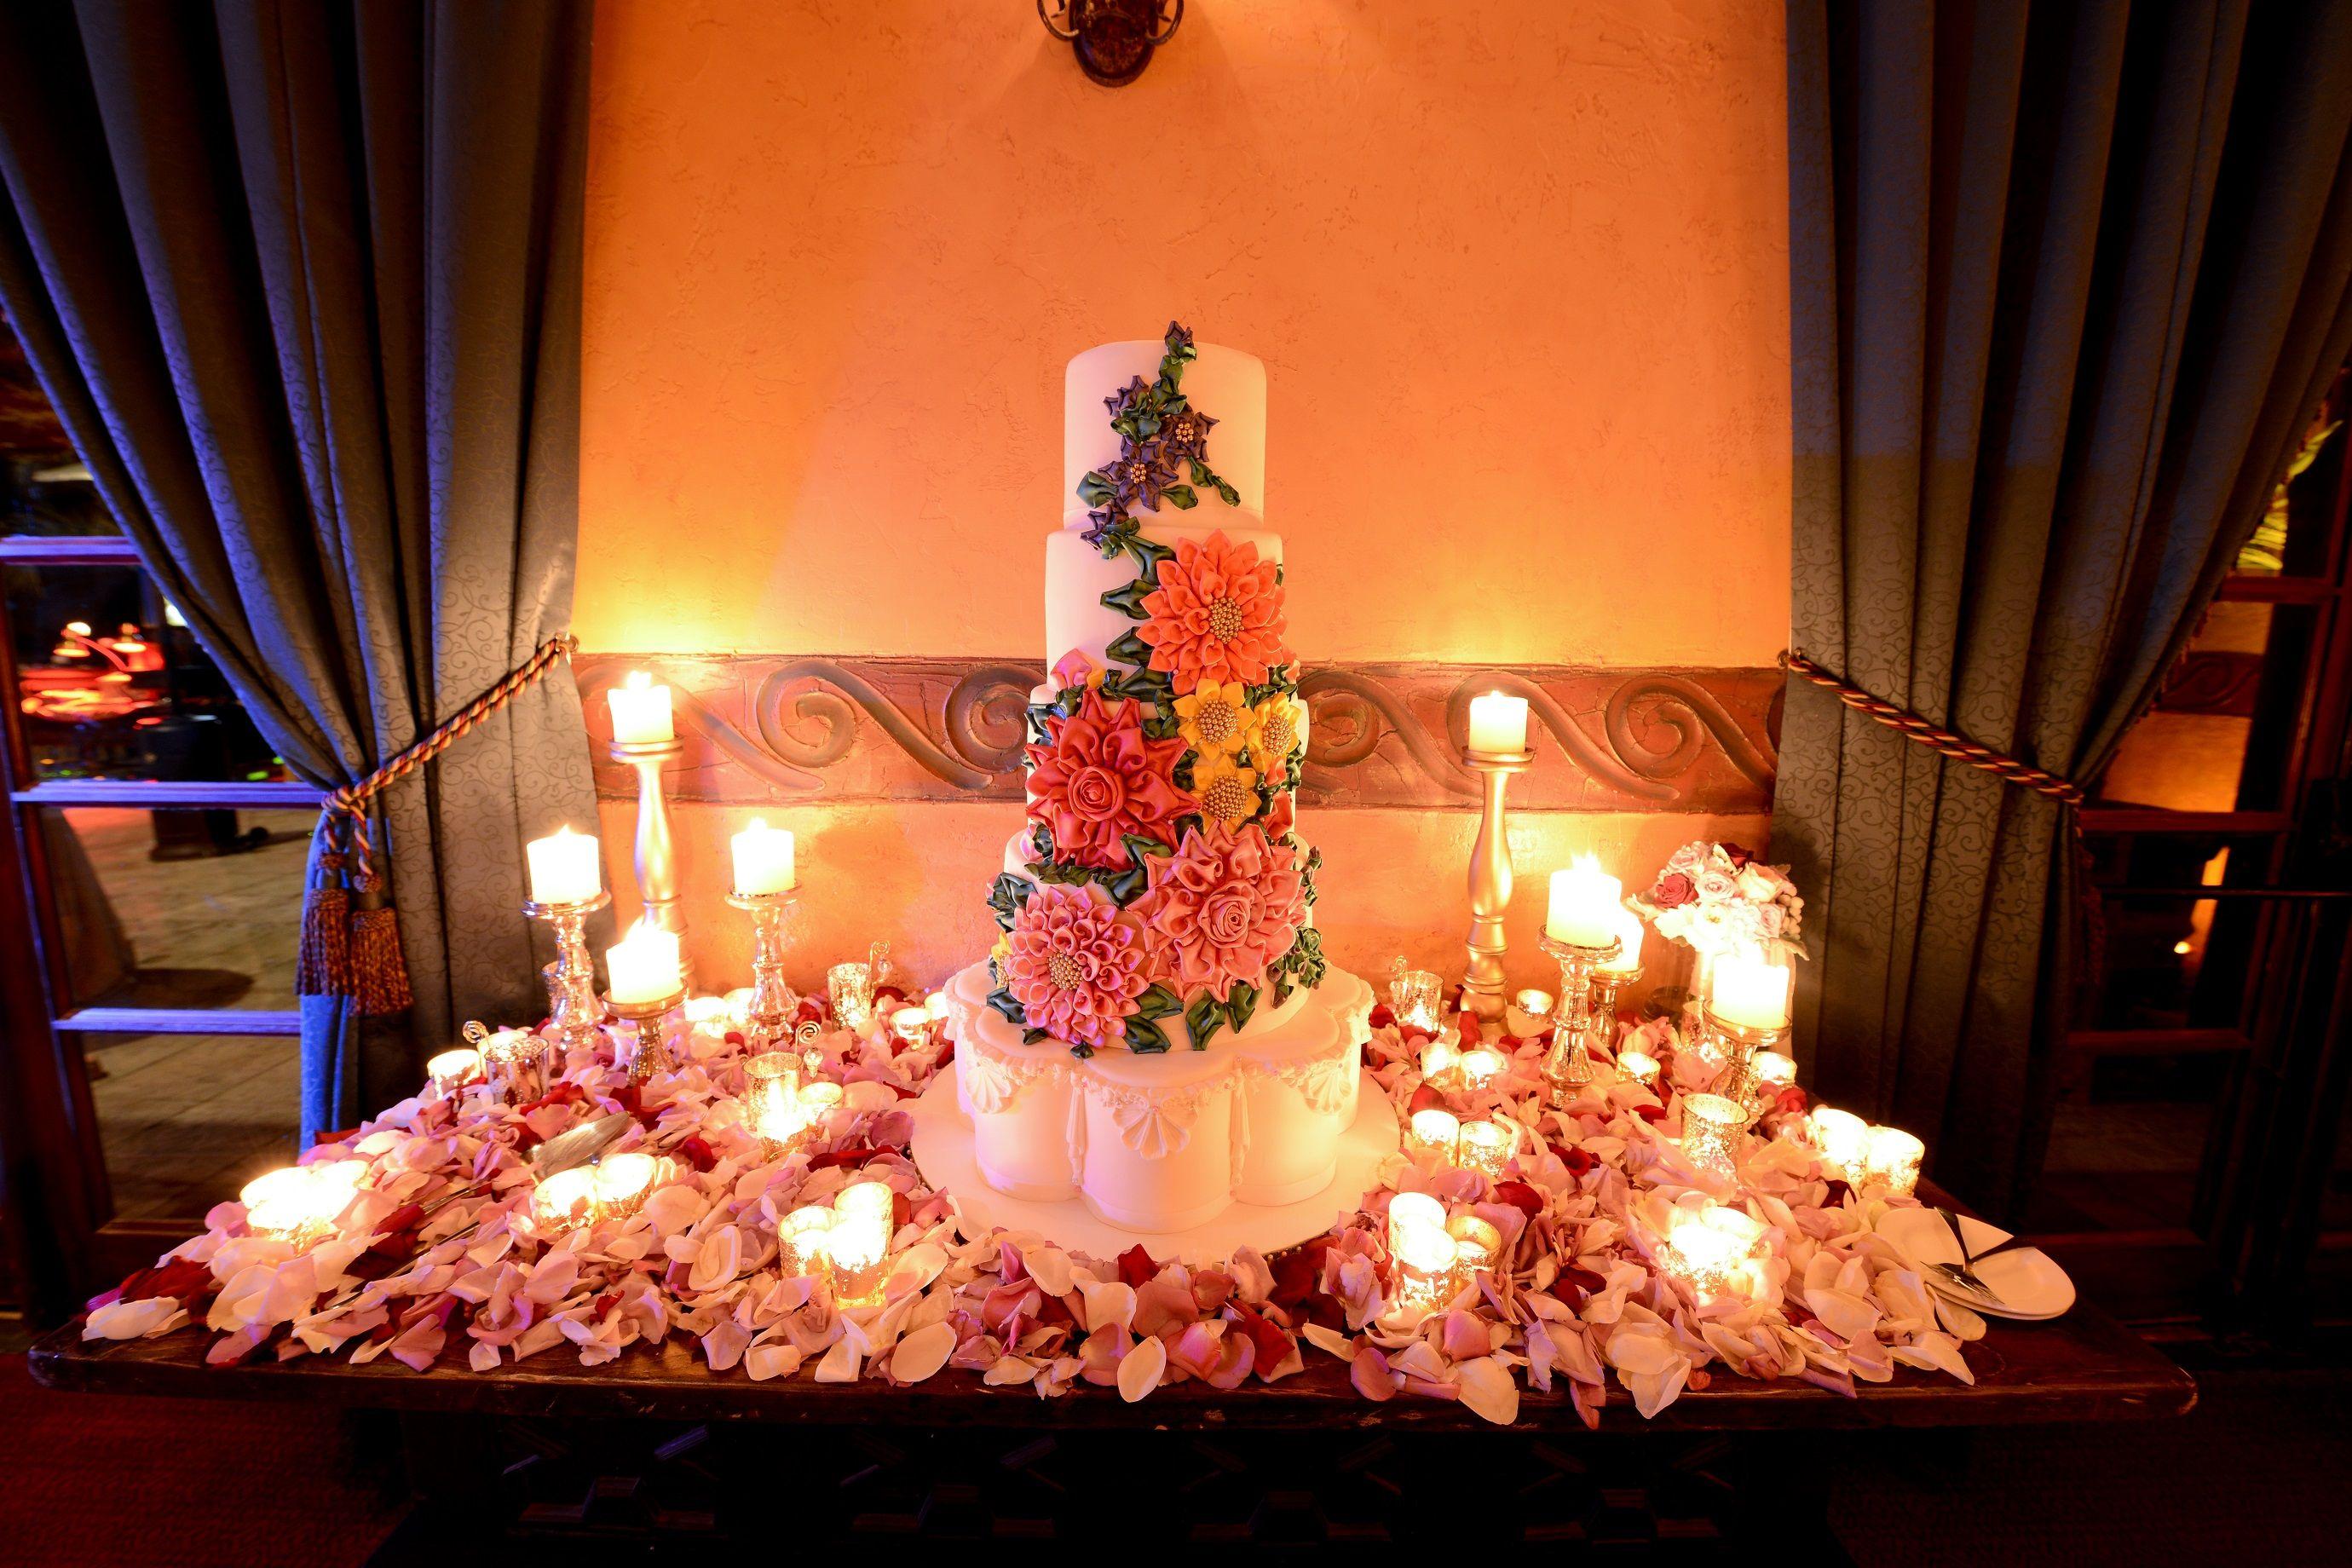 Kamins Blog 11 Jpg 2760 1840 Rose Petals Table Decorations Rose Wedding